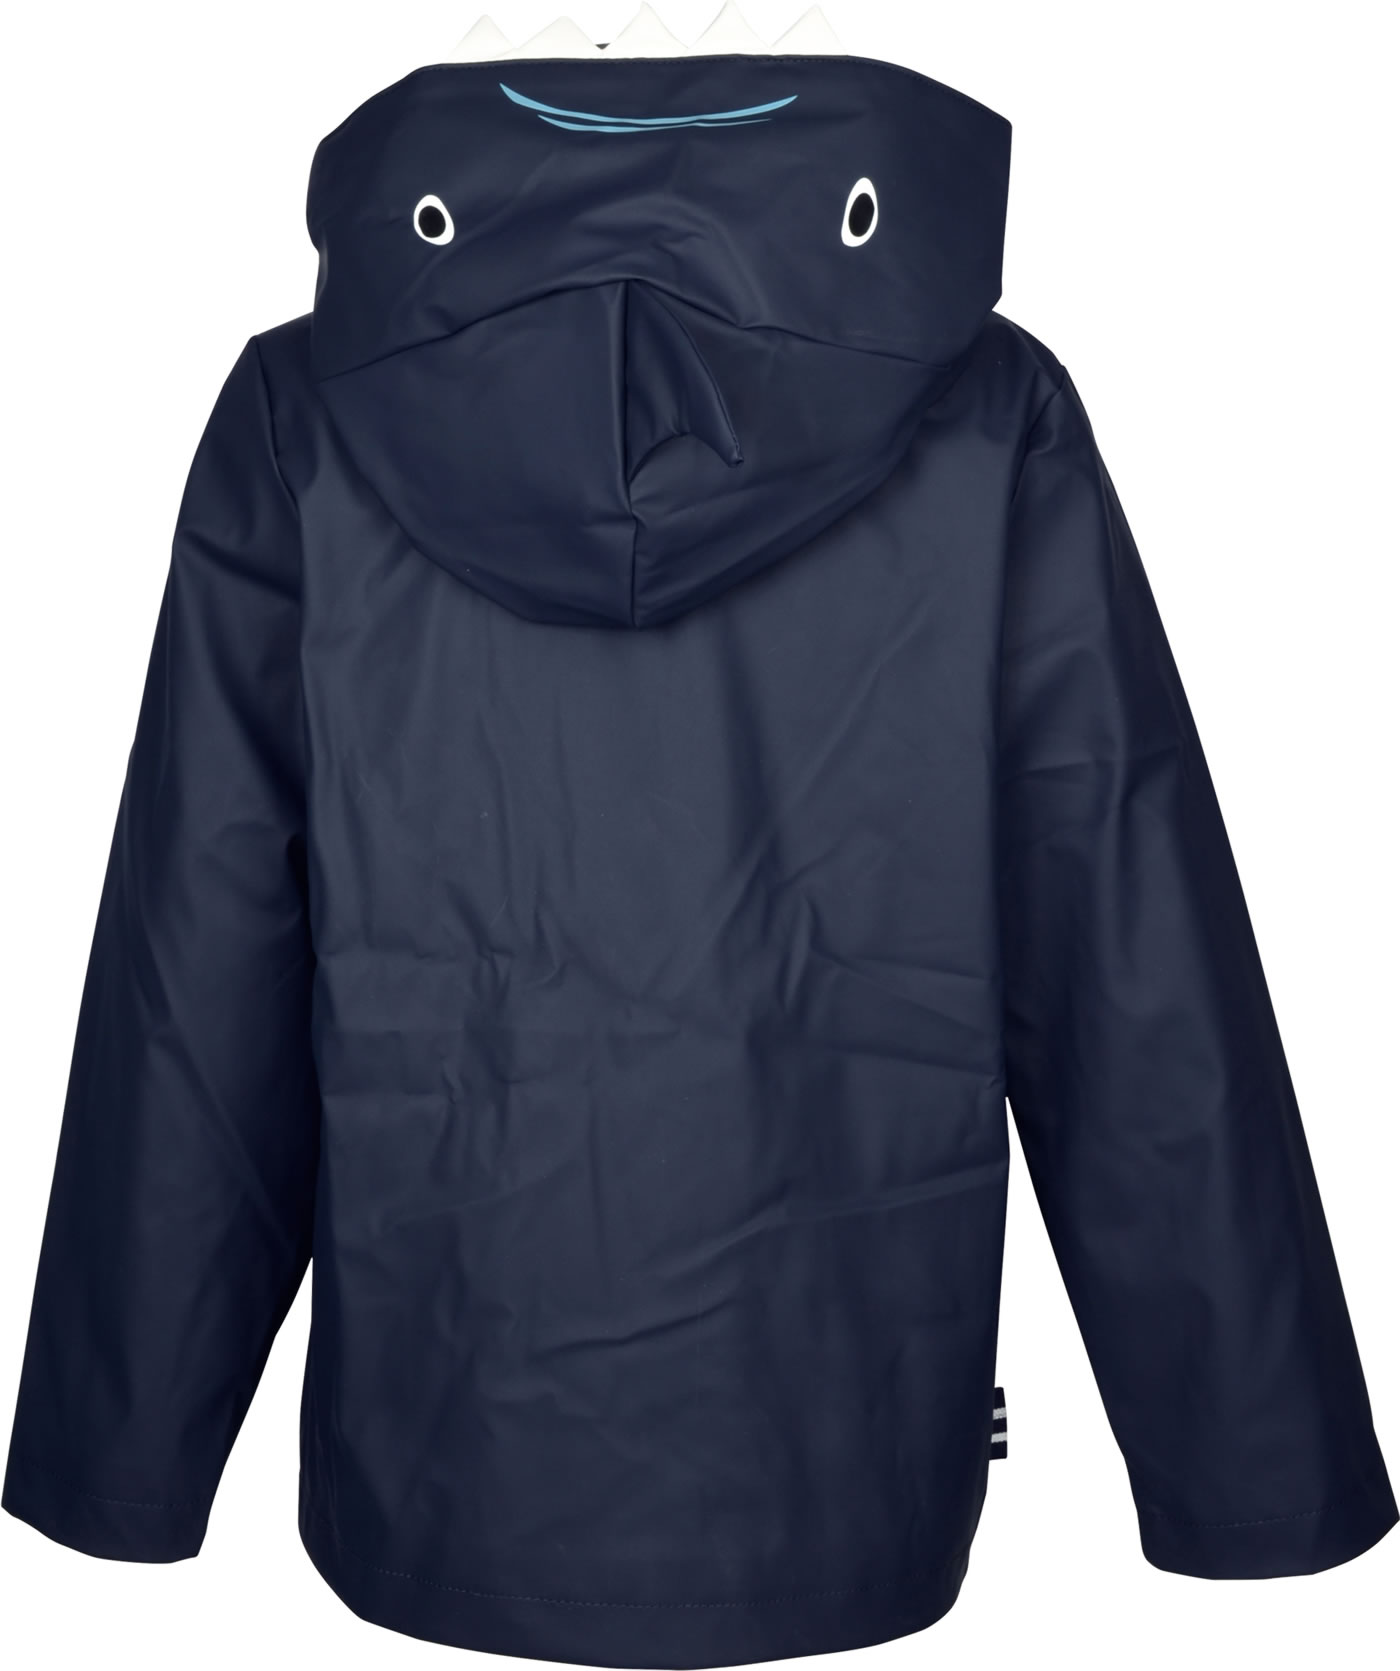 Joules Baby Riverside Jacket